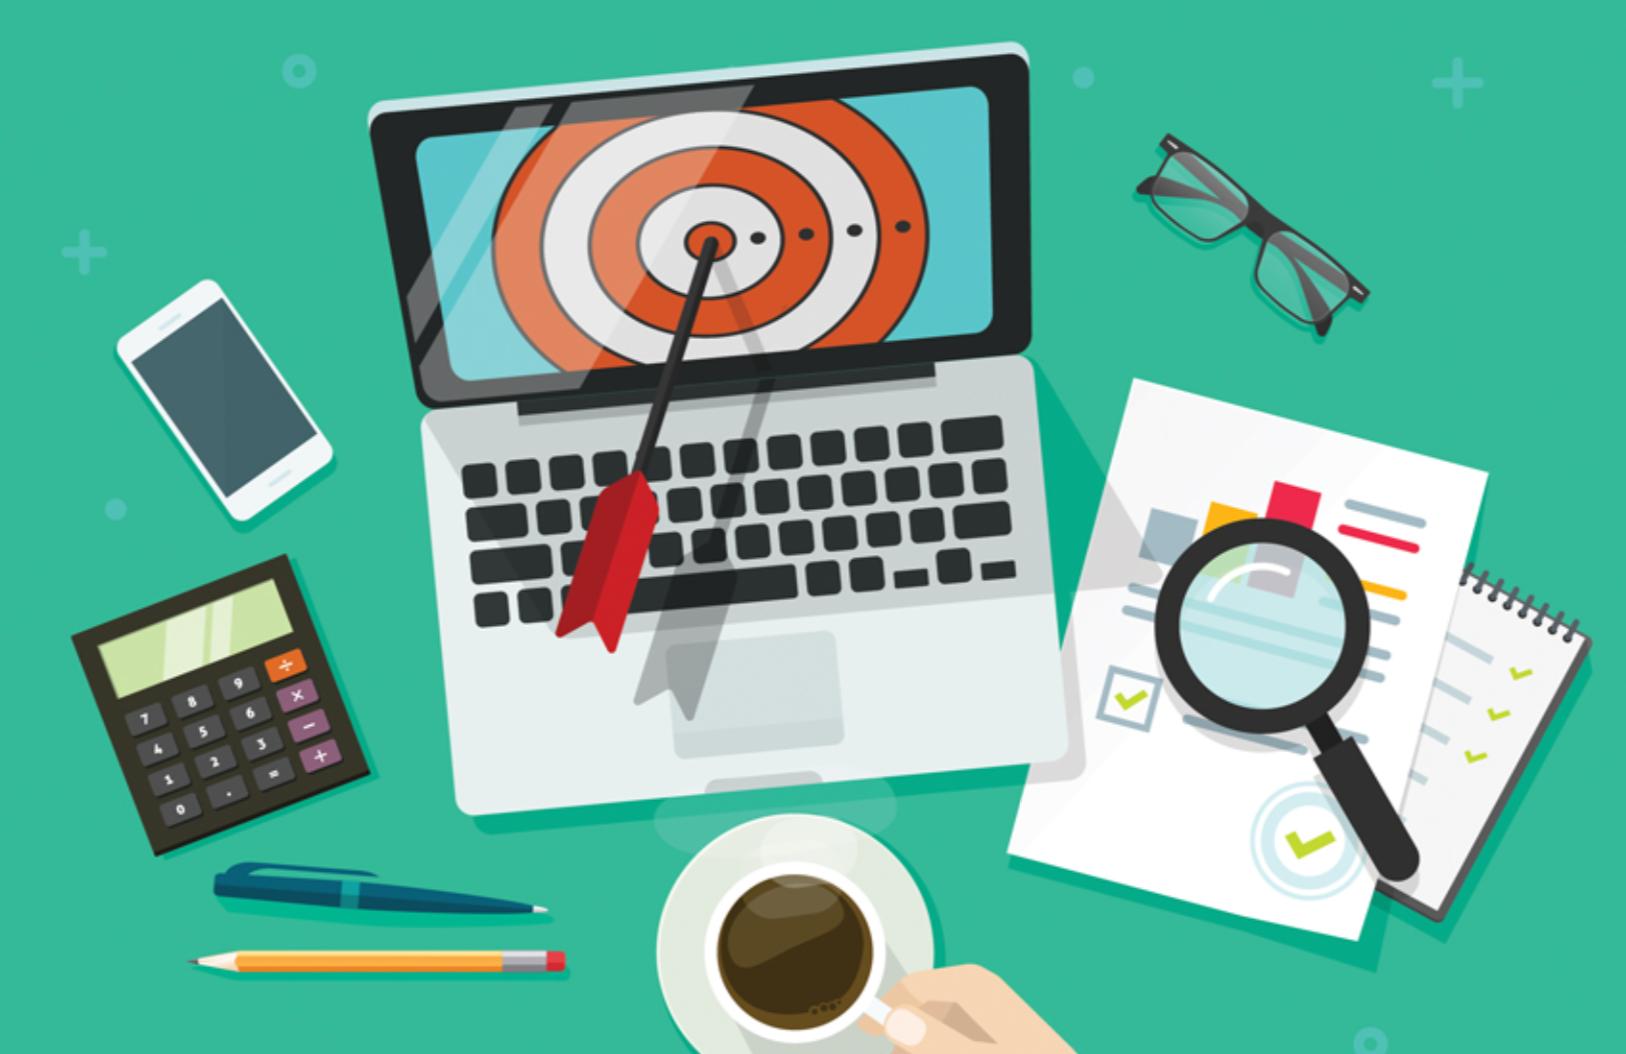 (Whitepaper Series) 5 Benefits of Account-Based Marketing